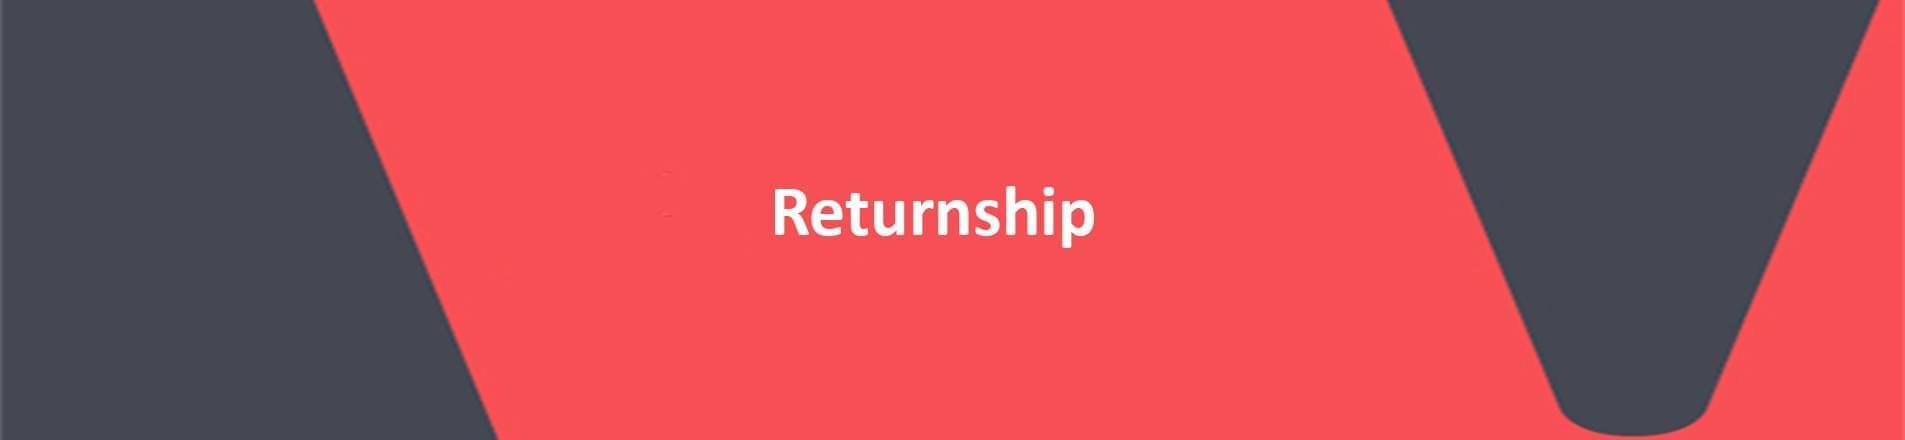 Returnship header image